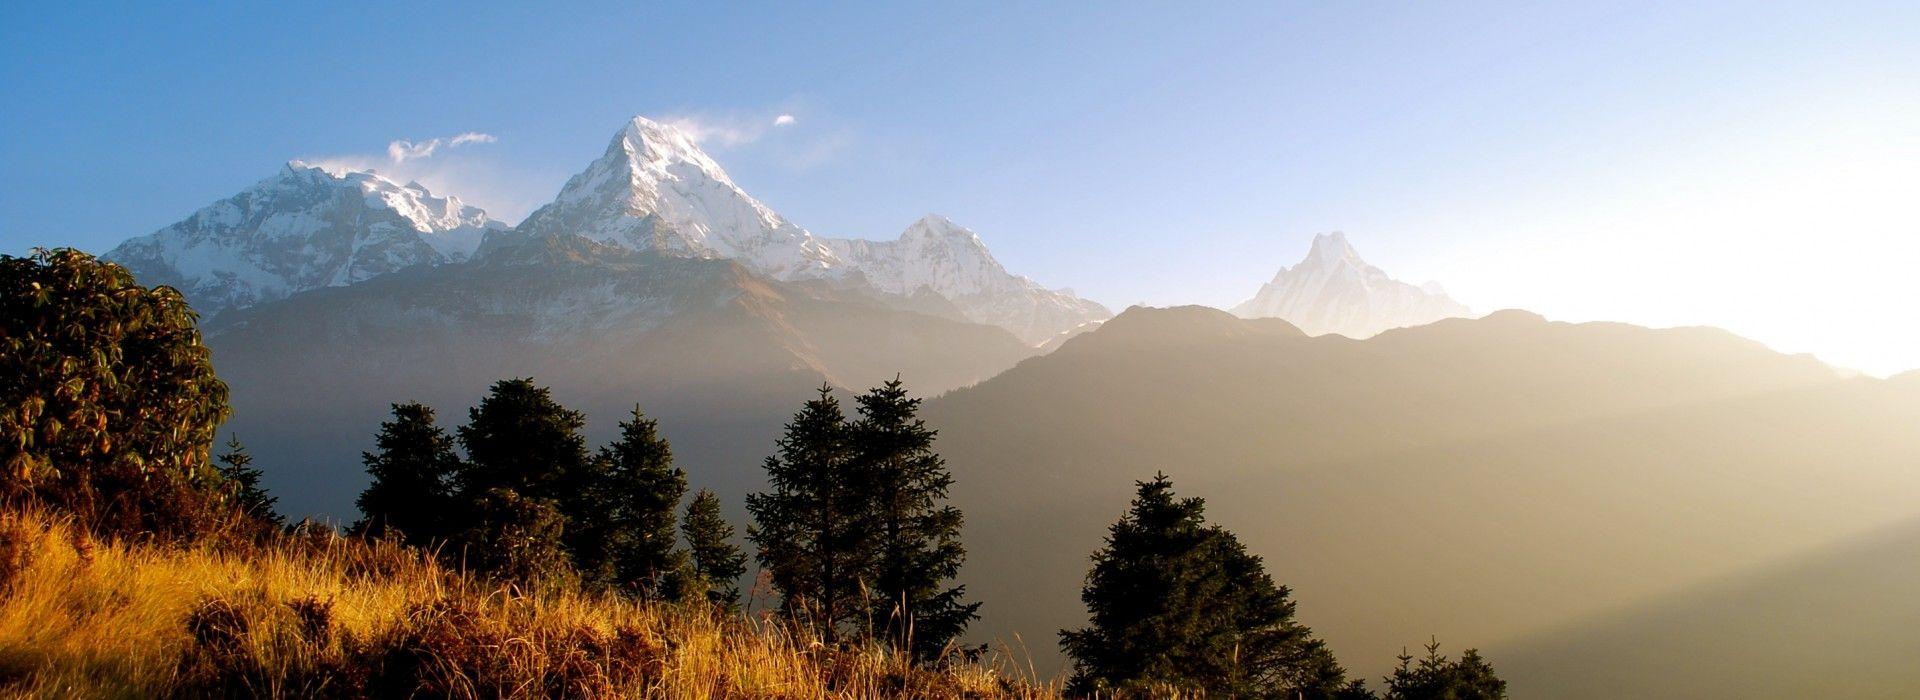 Luxury Tours in Kathmandu